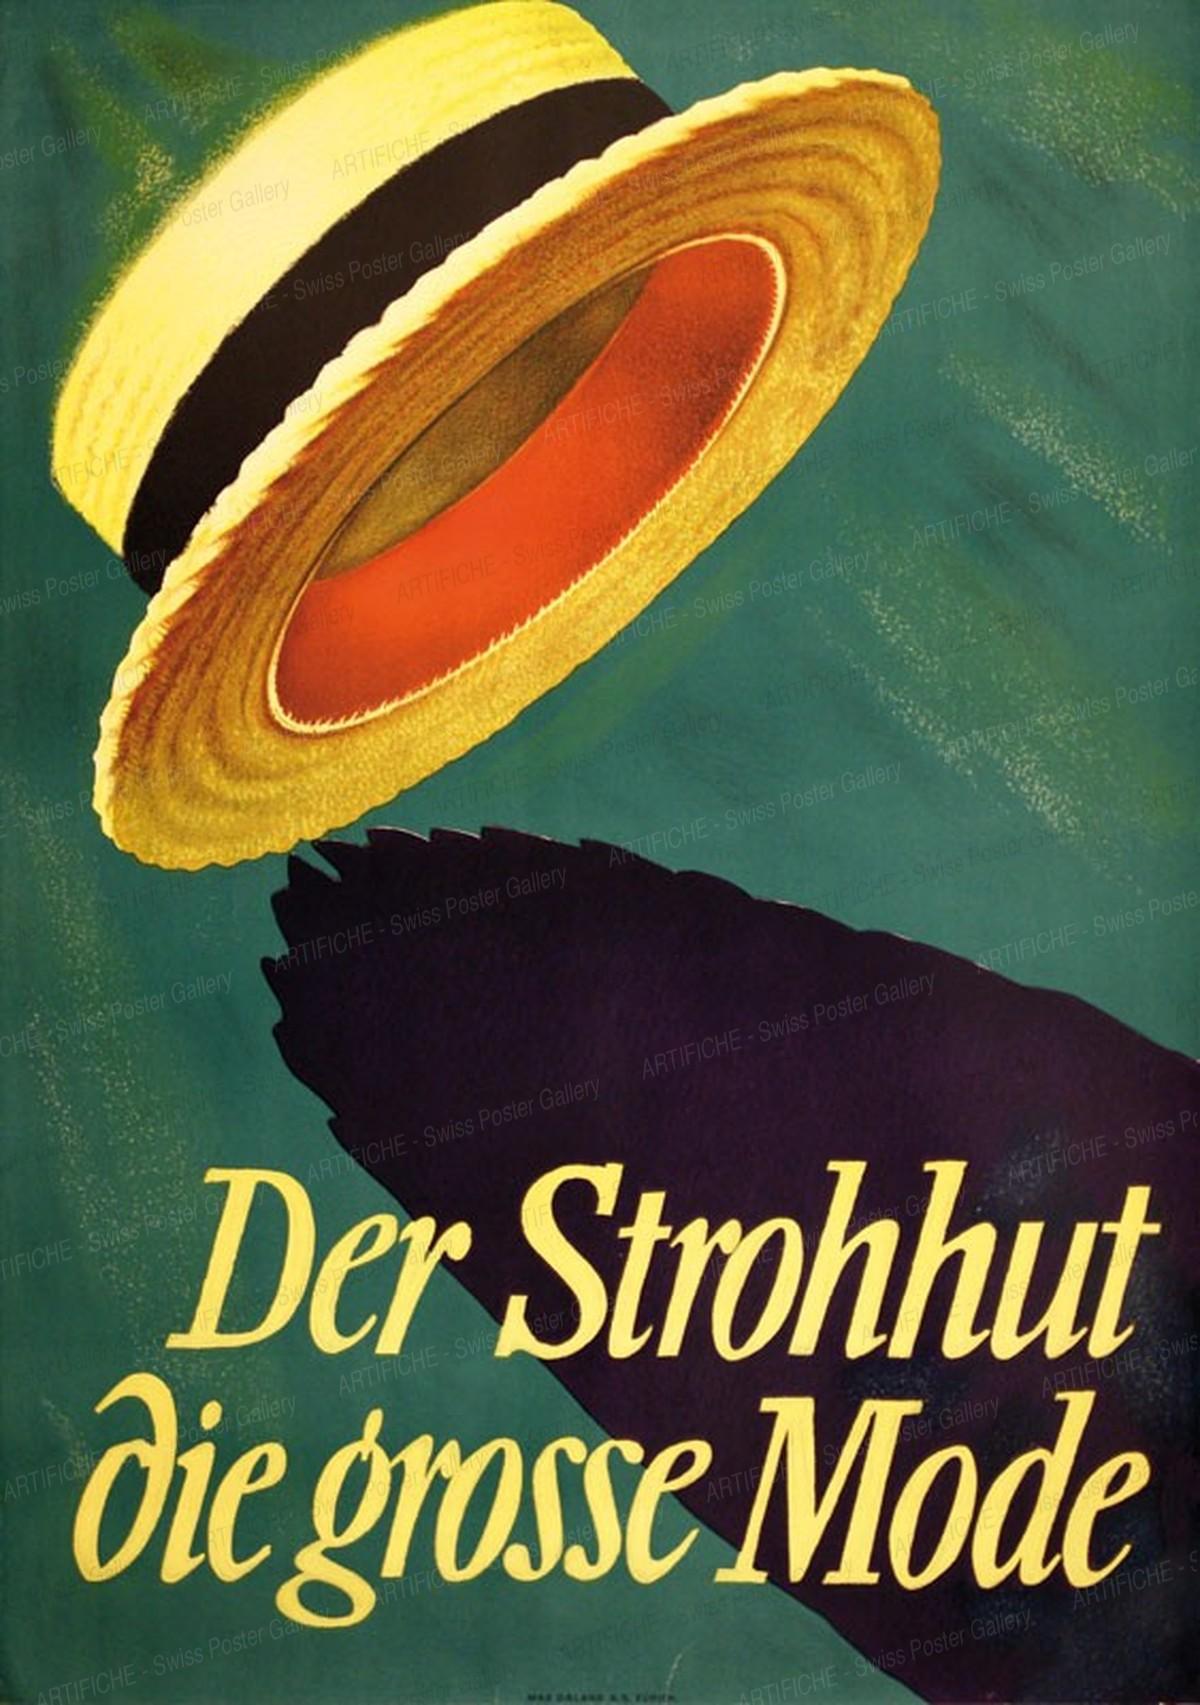 Der Strohhut – Die grosse Mode, Max Dalang